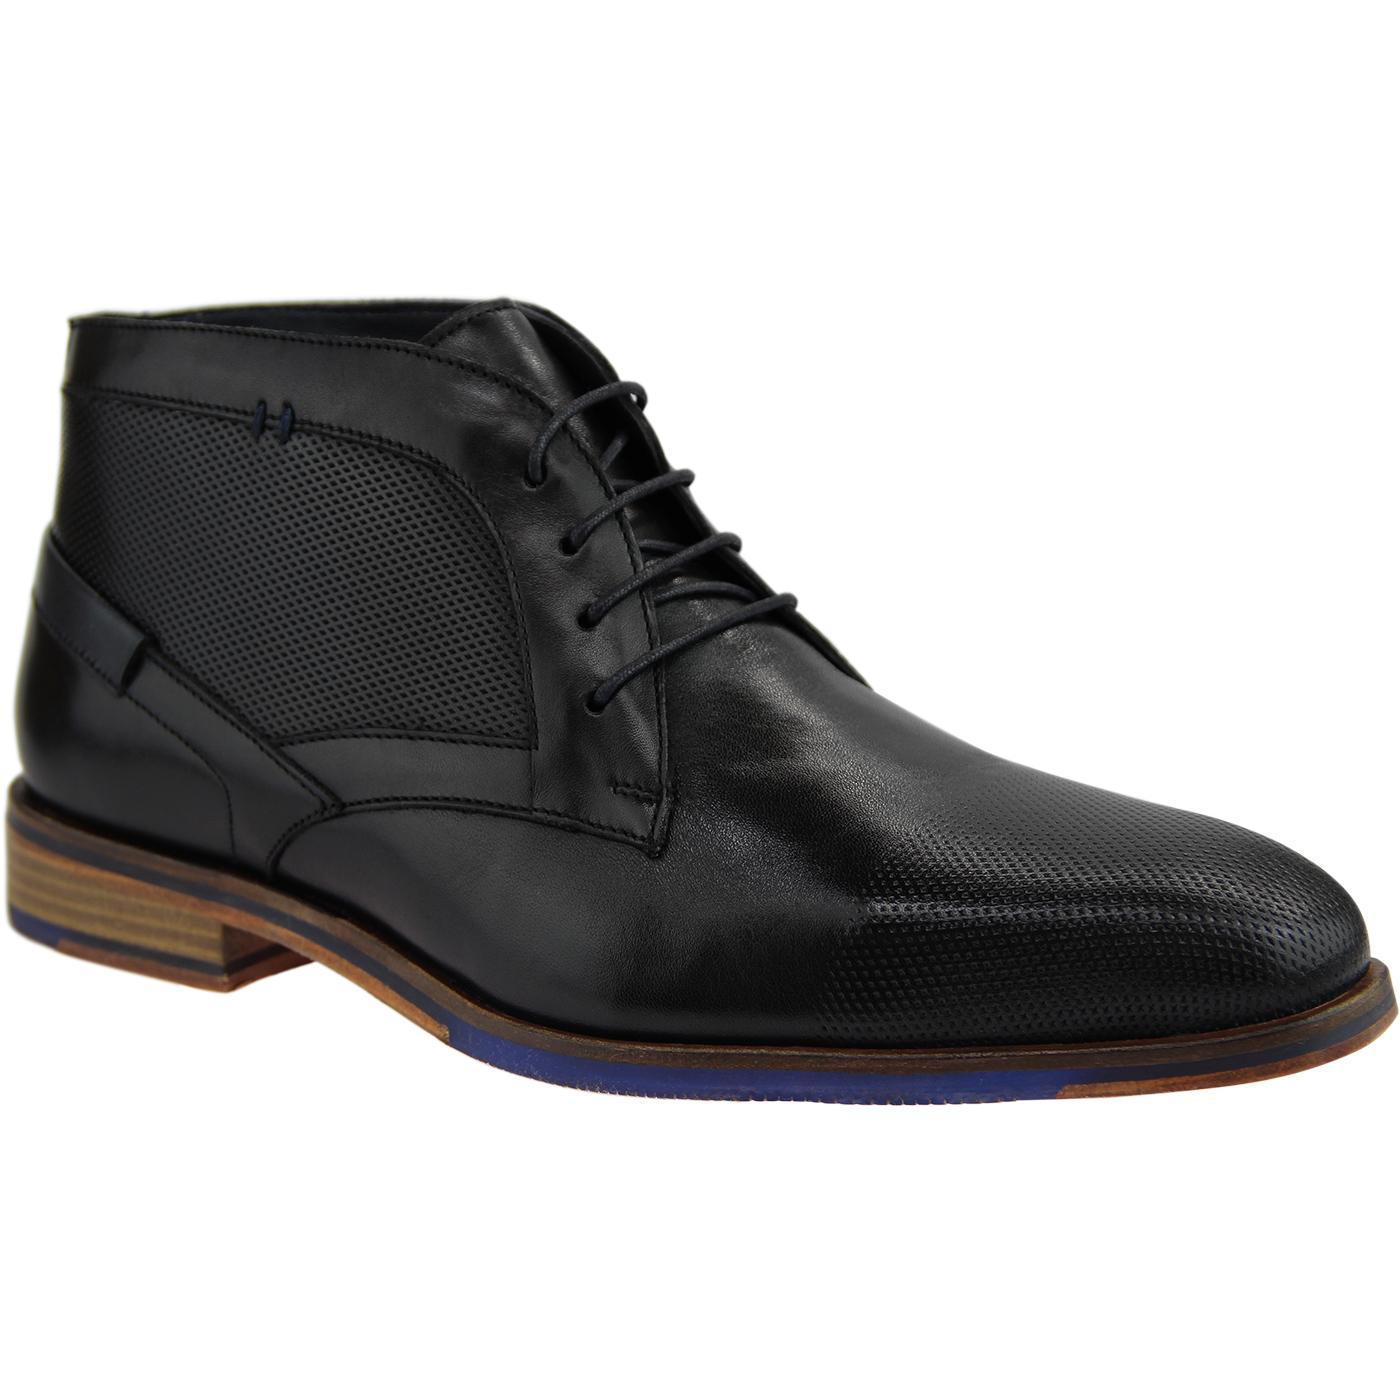 Dalton PAOLO VANDINI Mod Textured Worker Boots (B)